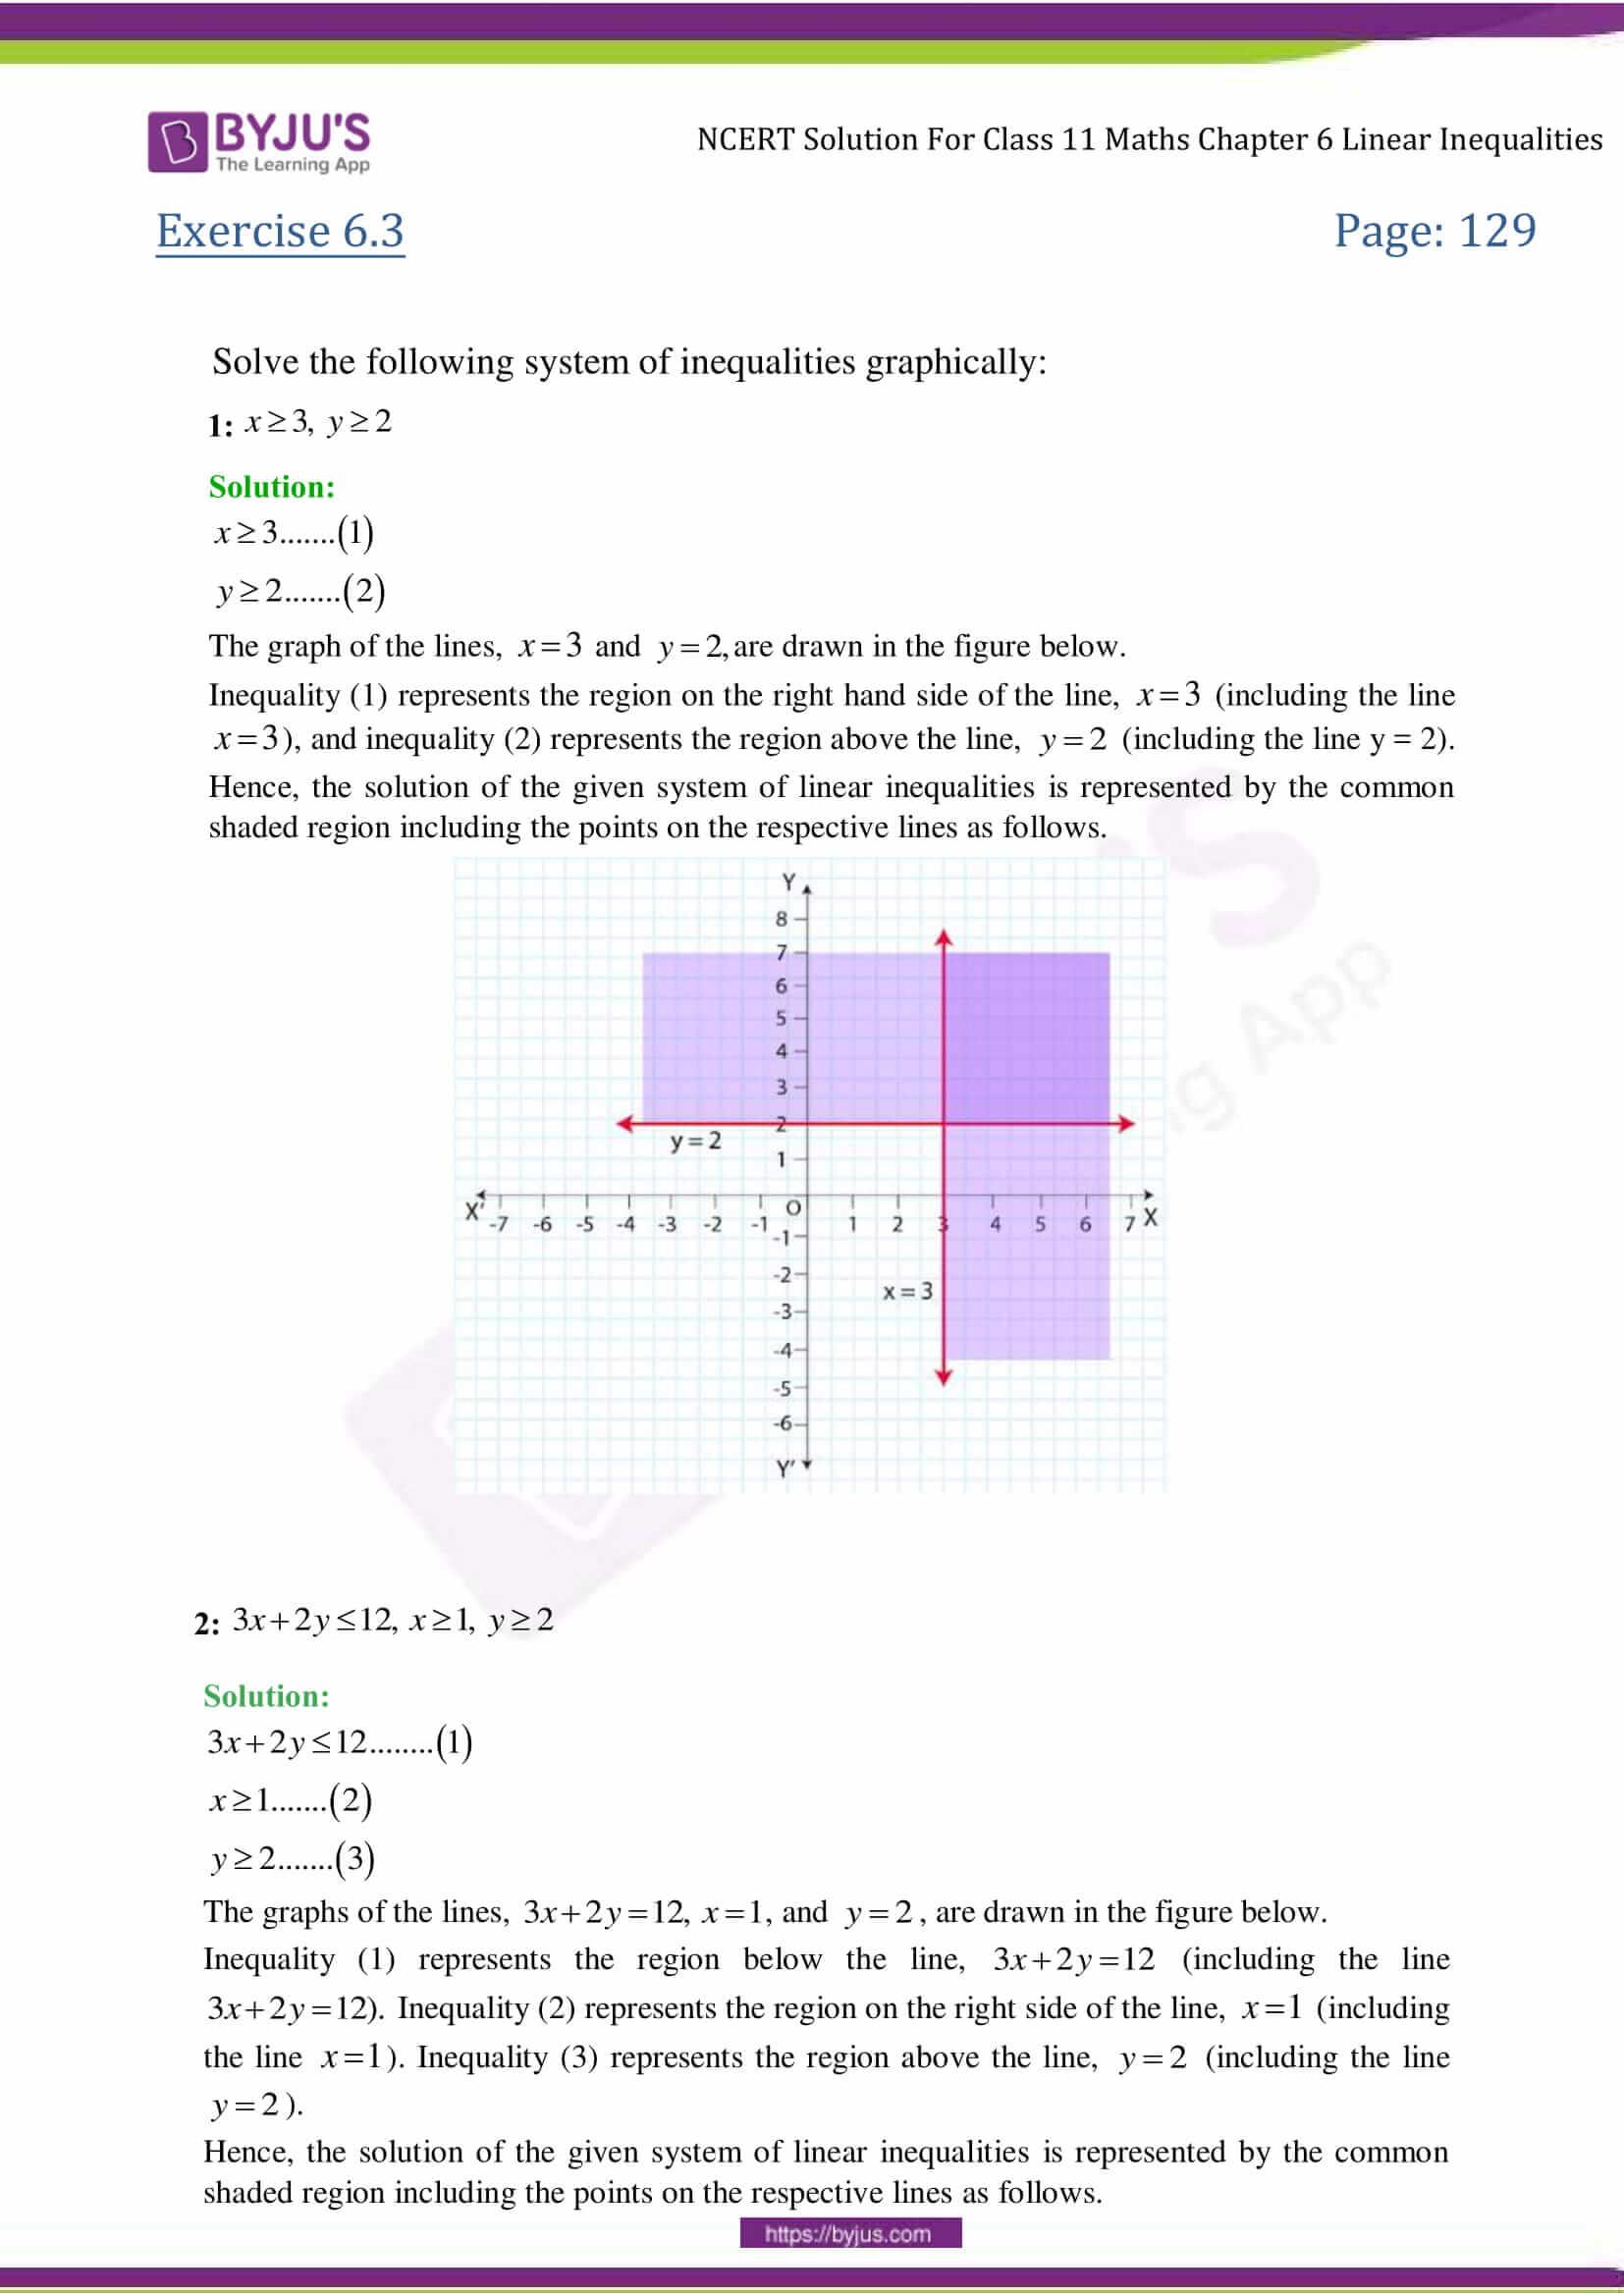 NCERT Solutions Class 11 Maths Chapter 6 Linear Inequalities